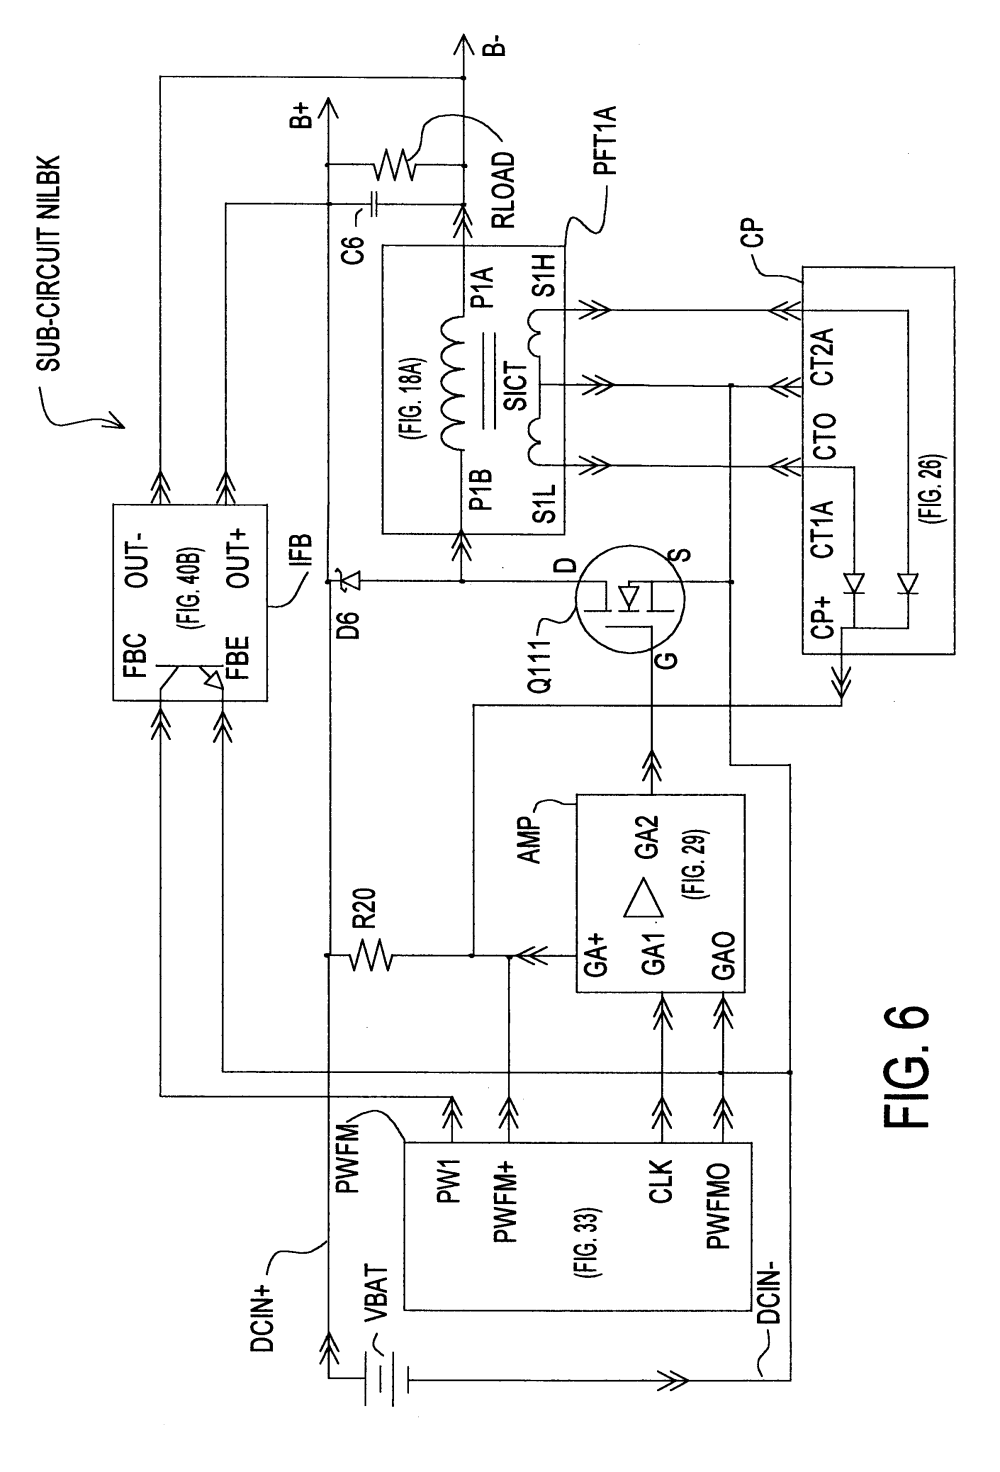 medium resolution of tekonsha voyager wiring diagram ford f250 tekonsha voyager wiring diagram ford tekonsha voyager wiring diagram 9030